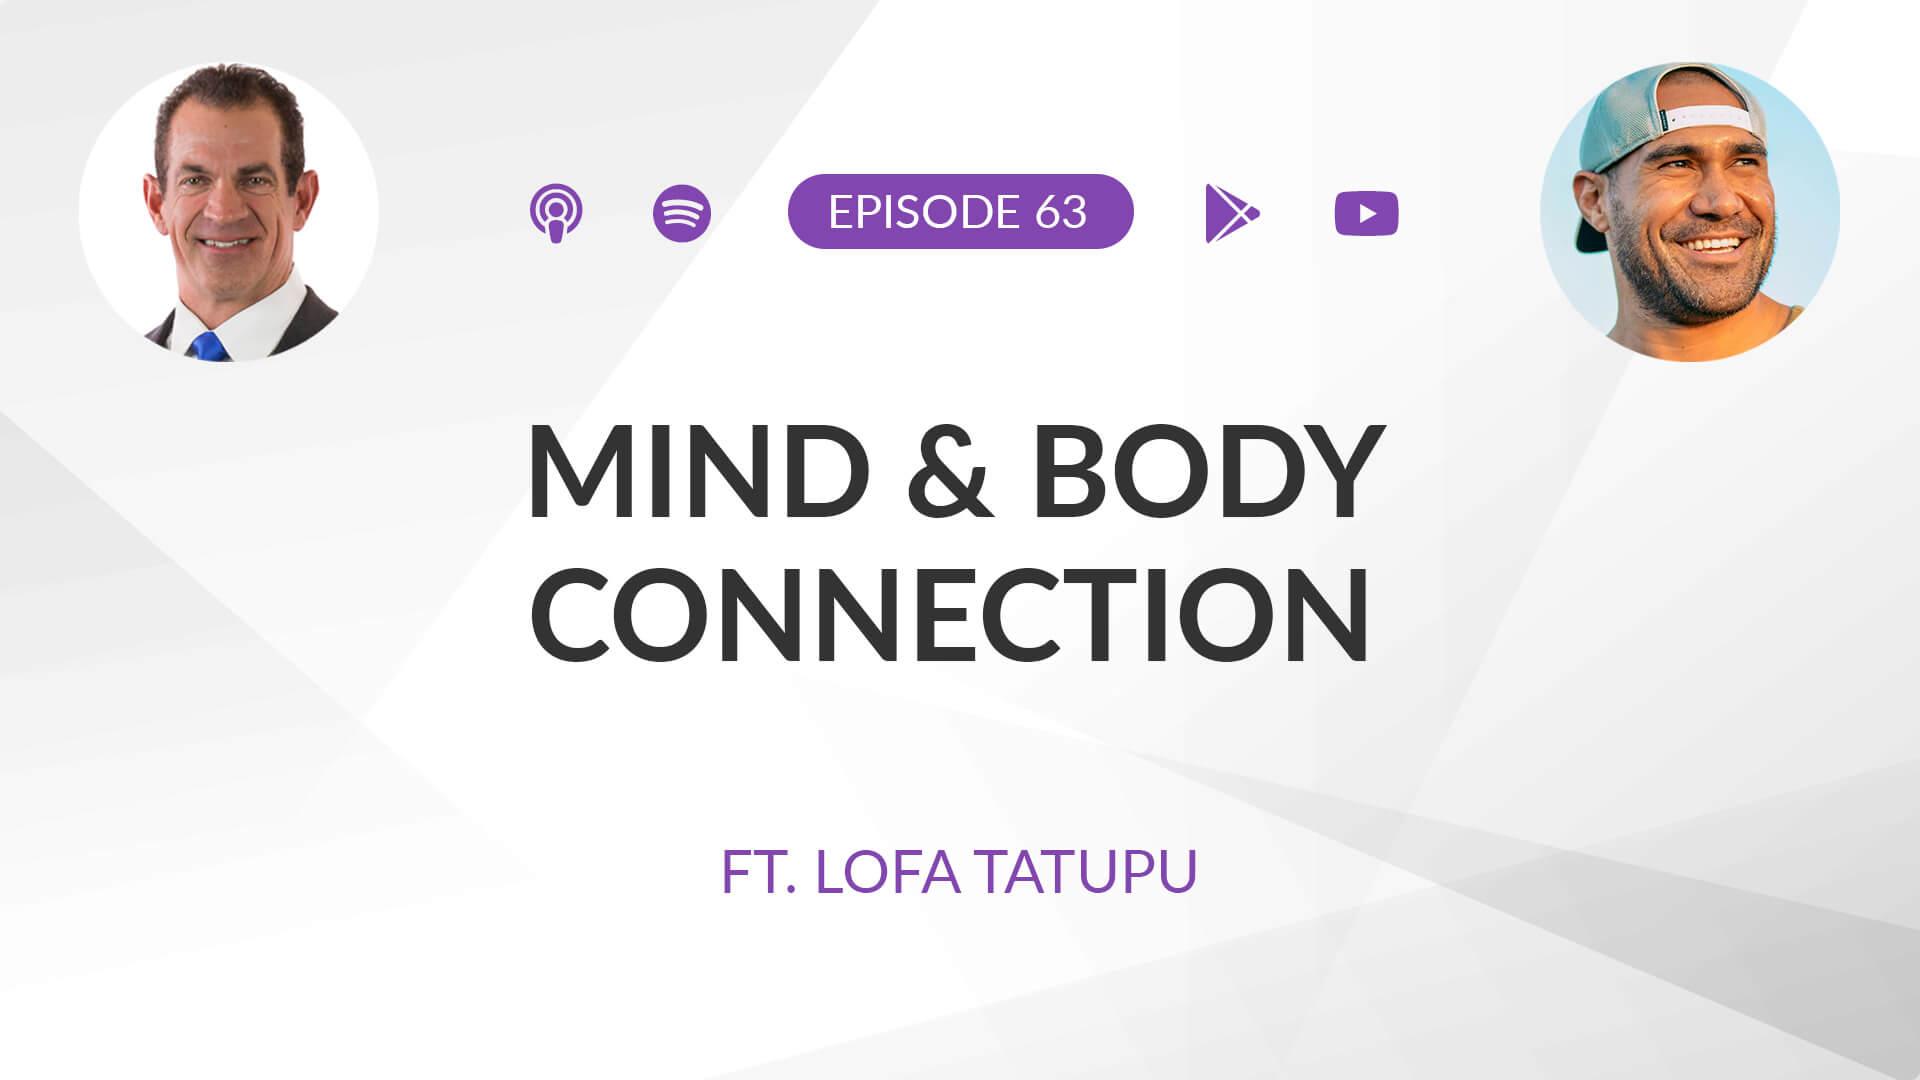 Ep 63: The Mind and Body Connection ft. Lofa Tatupu